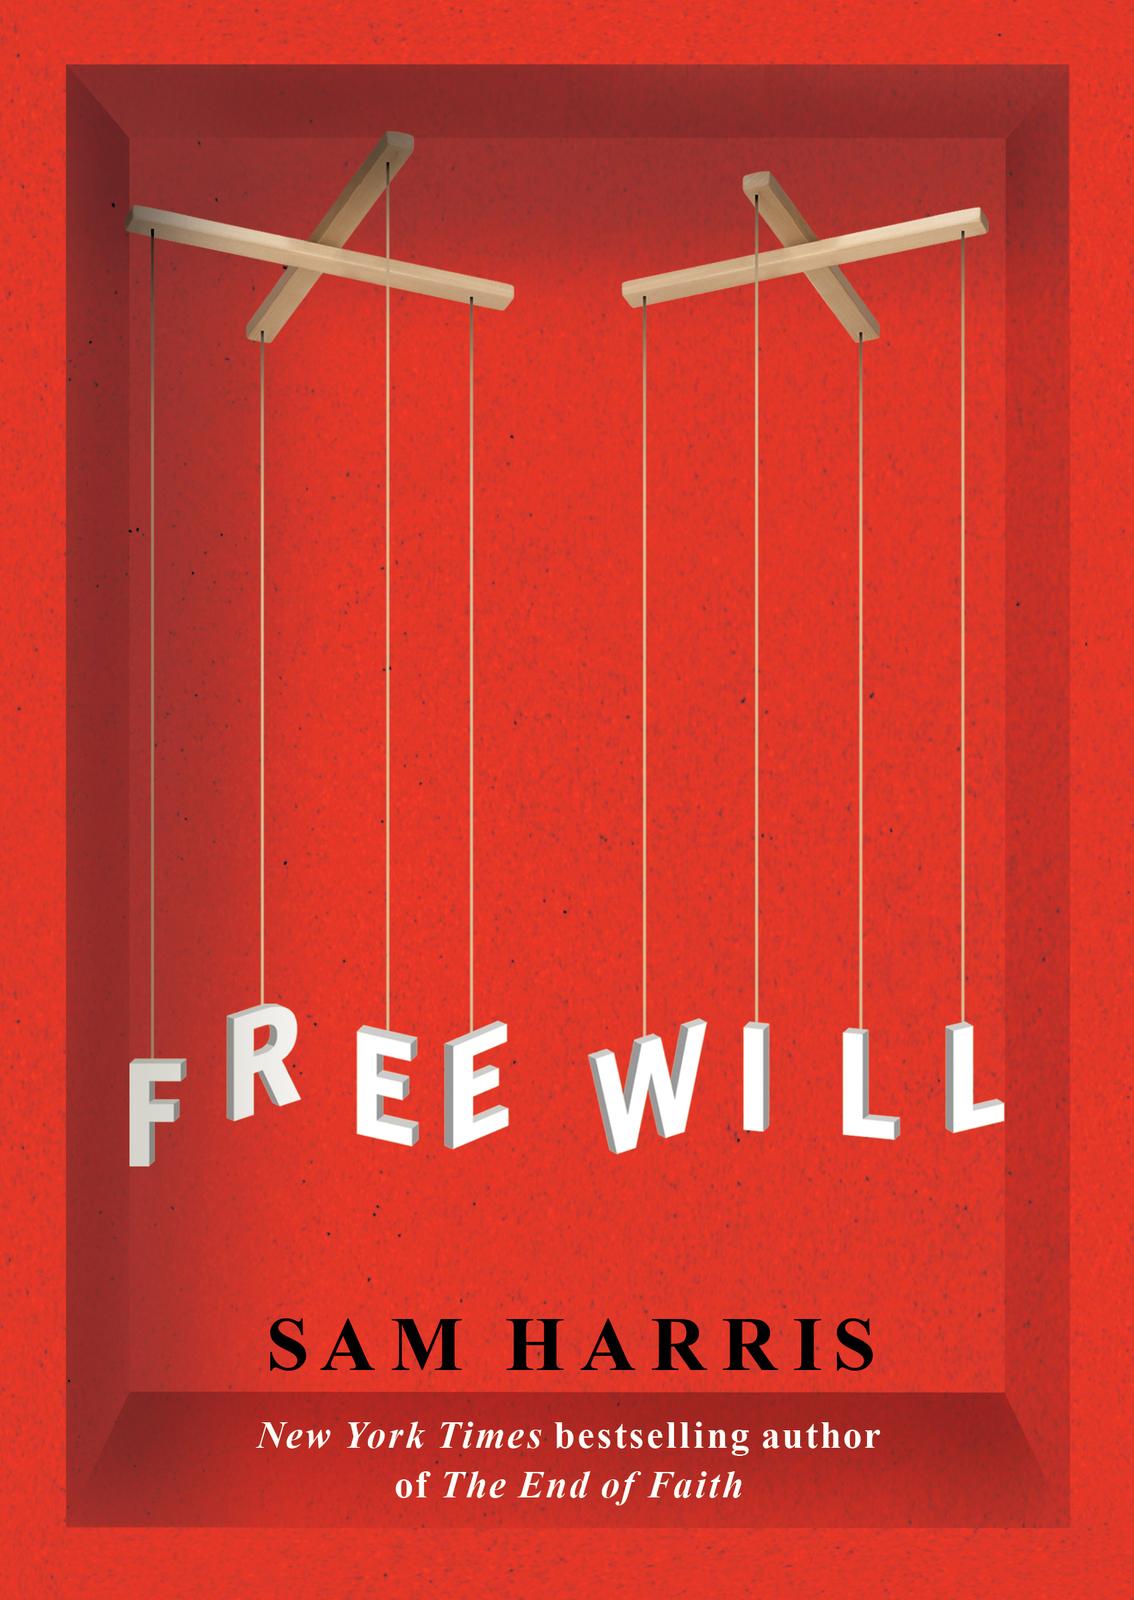 Free Will by Sam Harris image